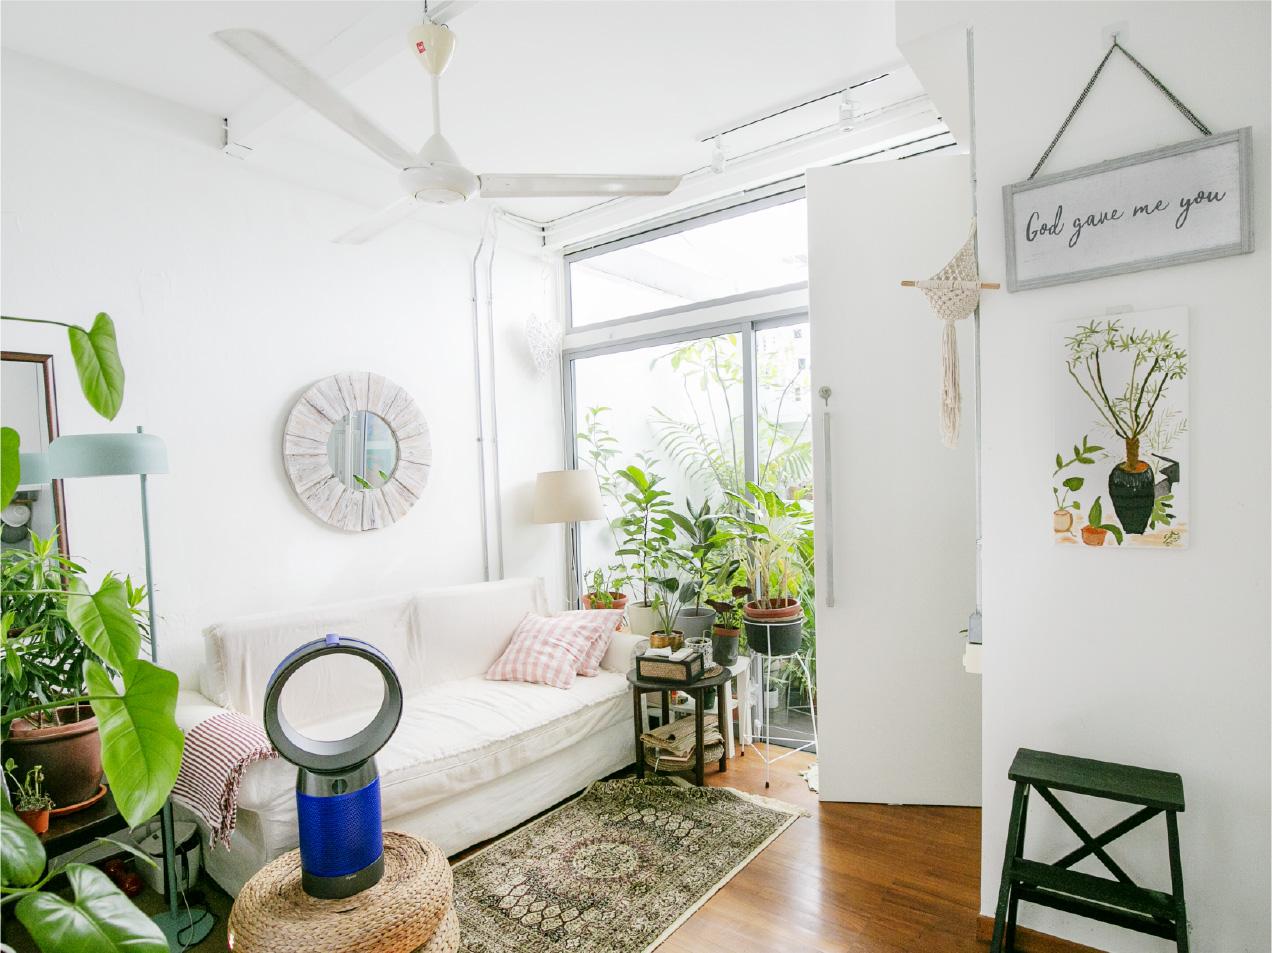 Inside Sherry Ann's home